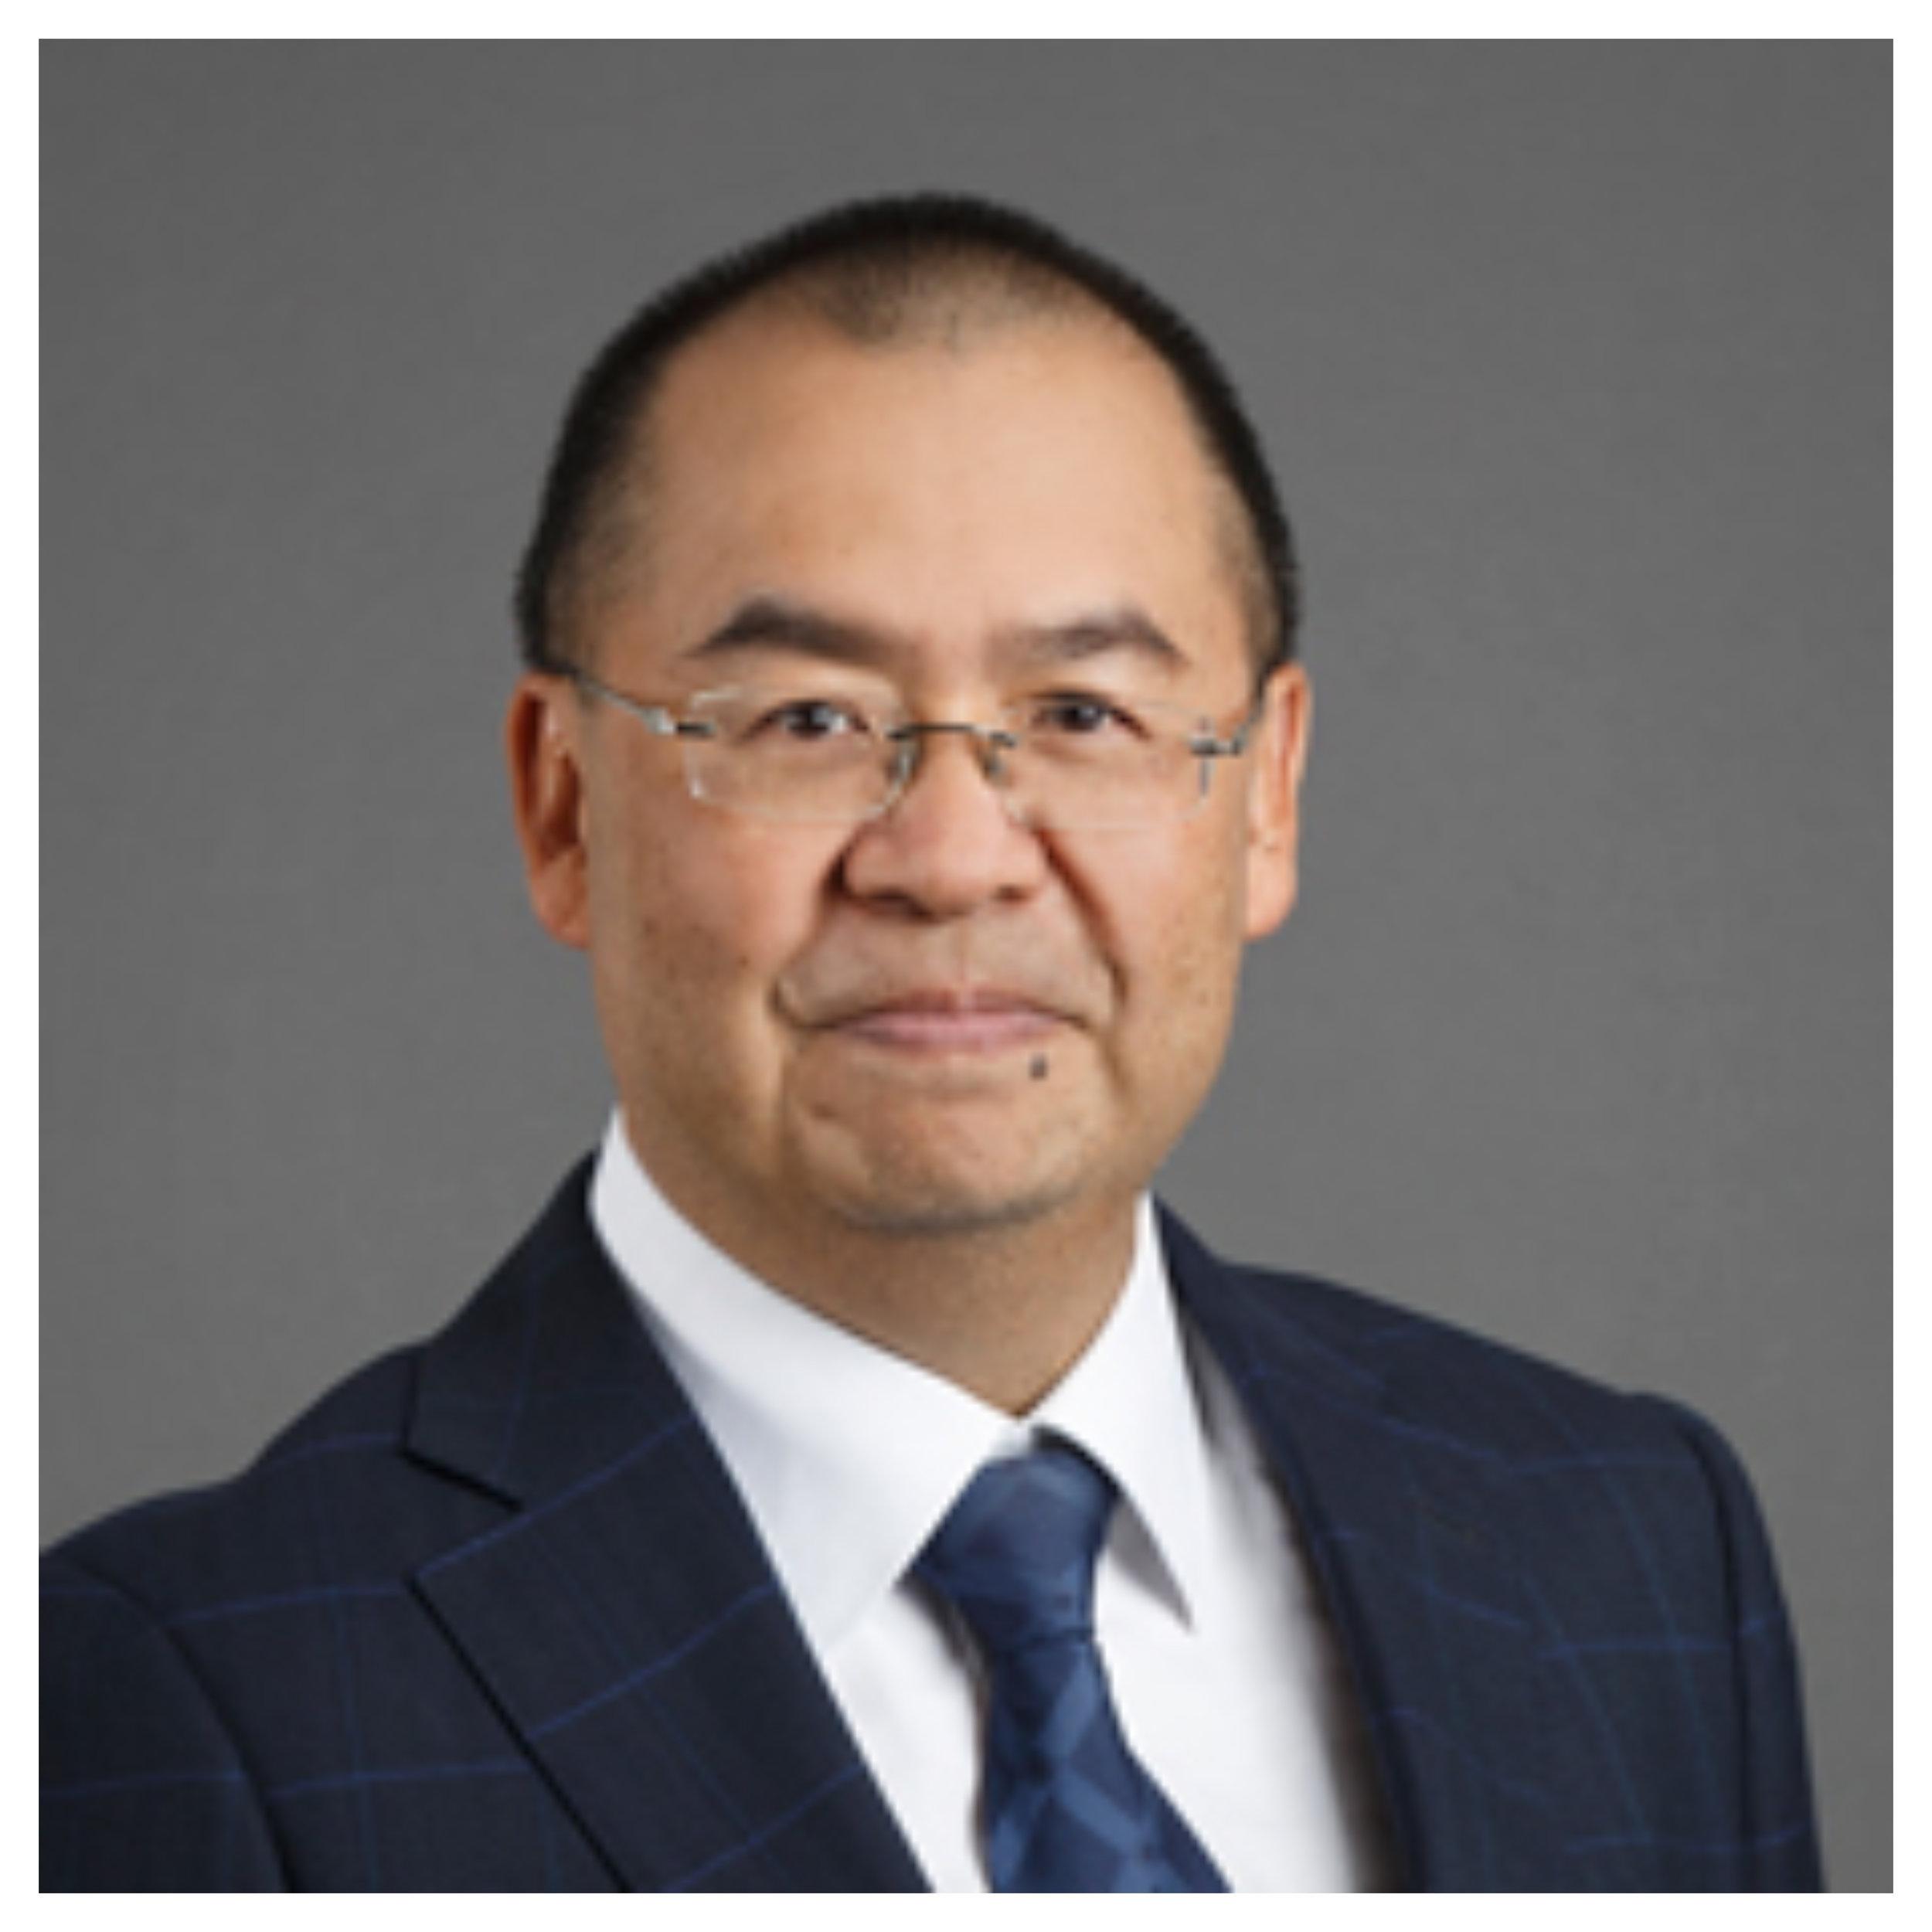 Brandon Khoo, Executive General Manager - Diversified Institutions, APRA